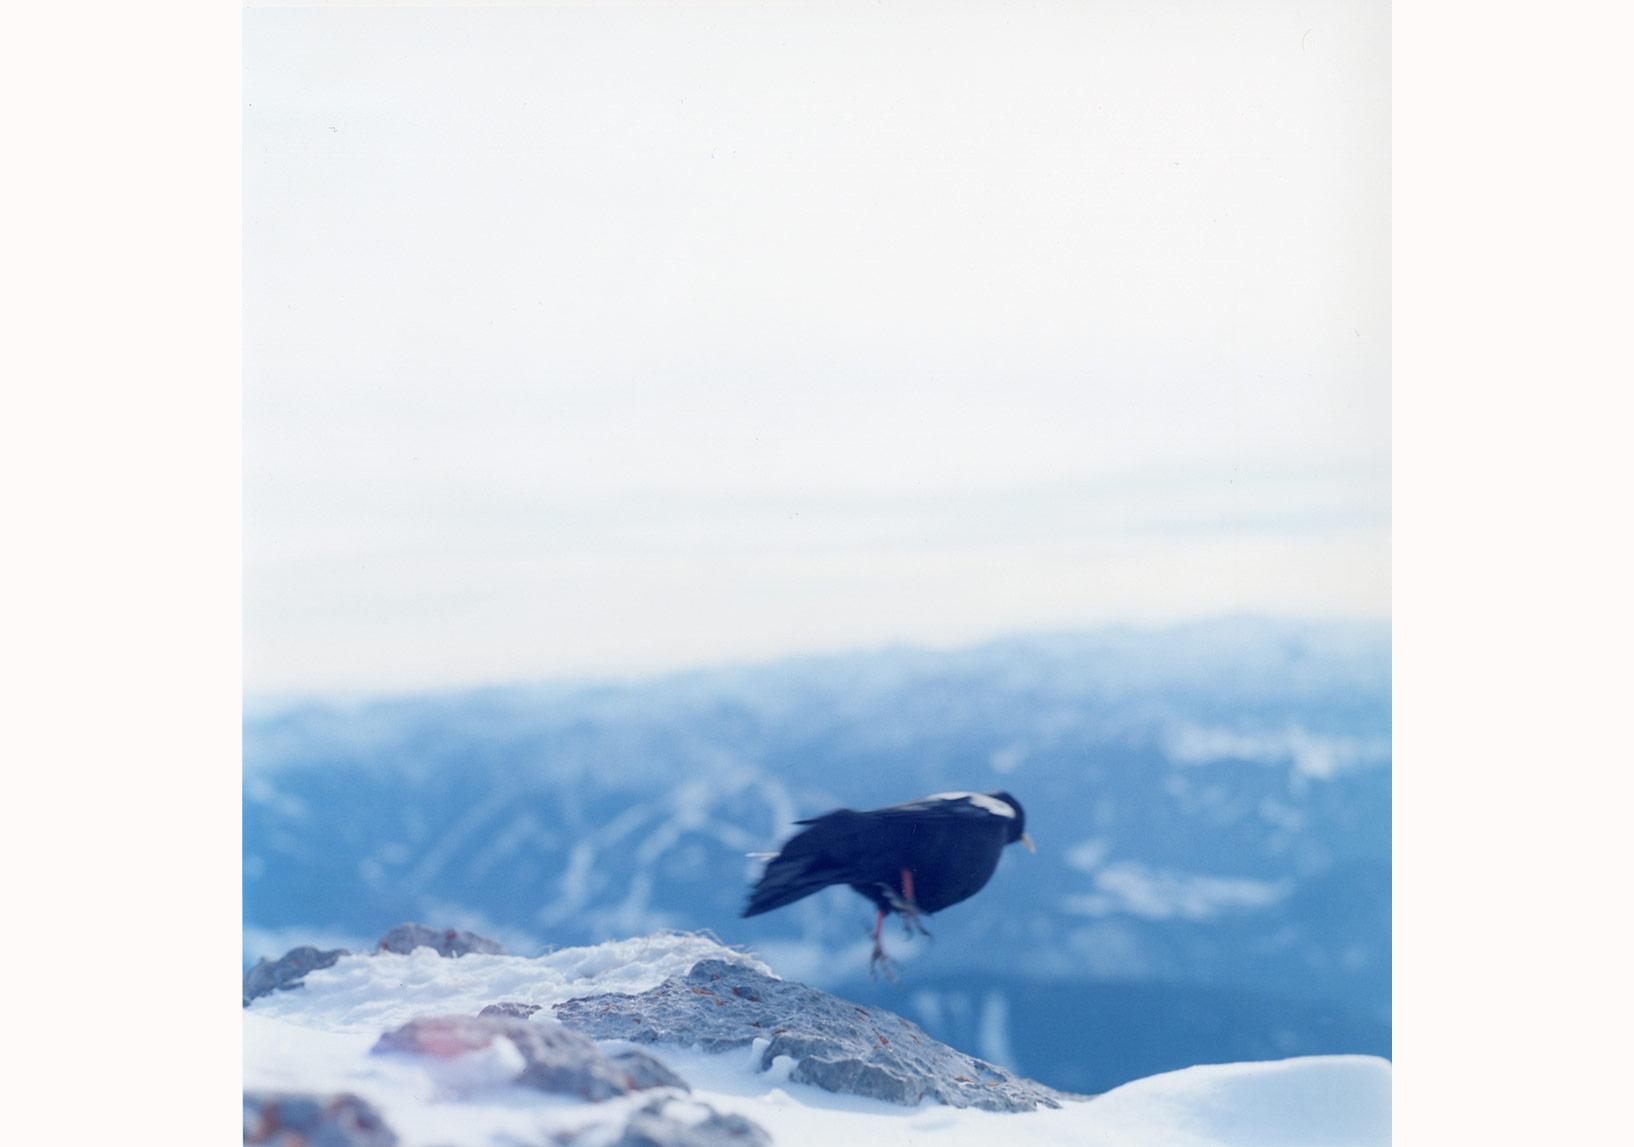 'İsimsiz', 'Search for the Sun' serisinden, 2015 © Rinko Kawauchi